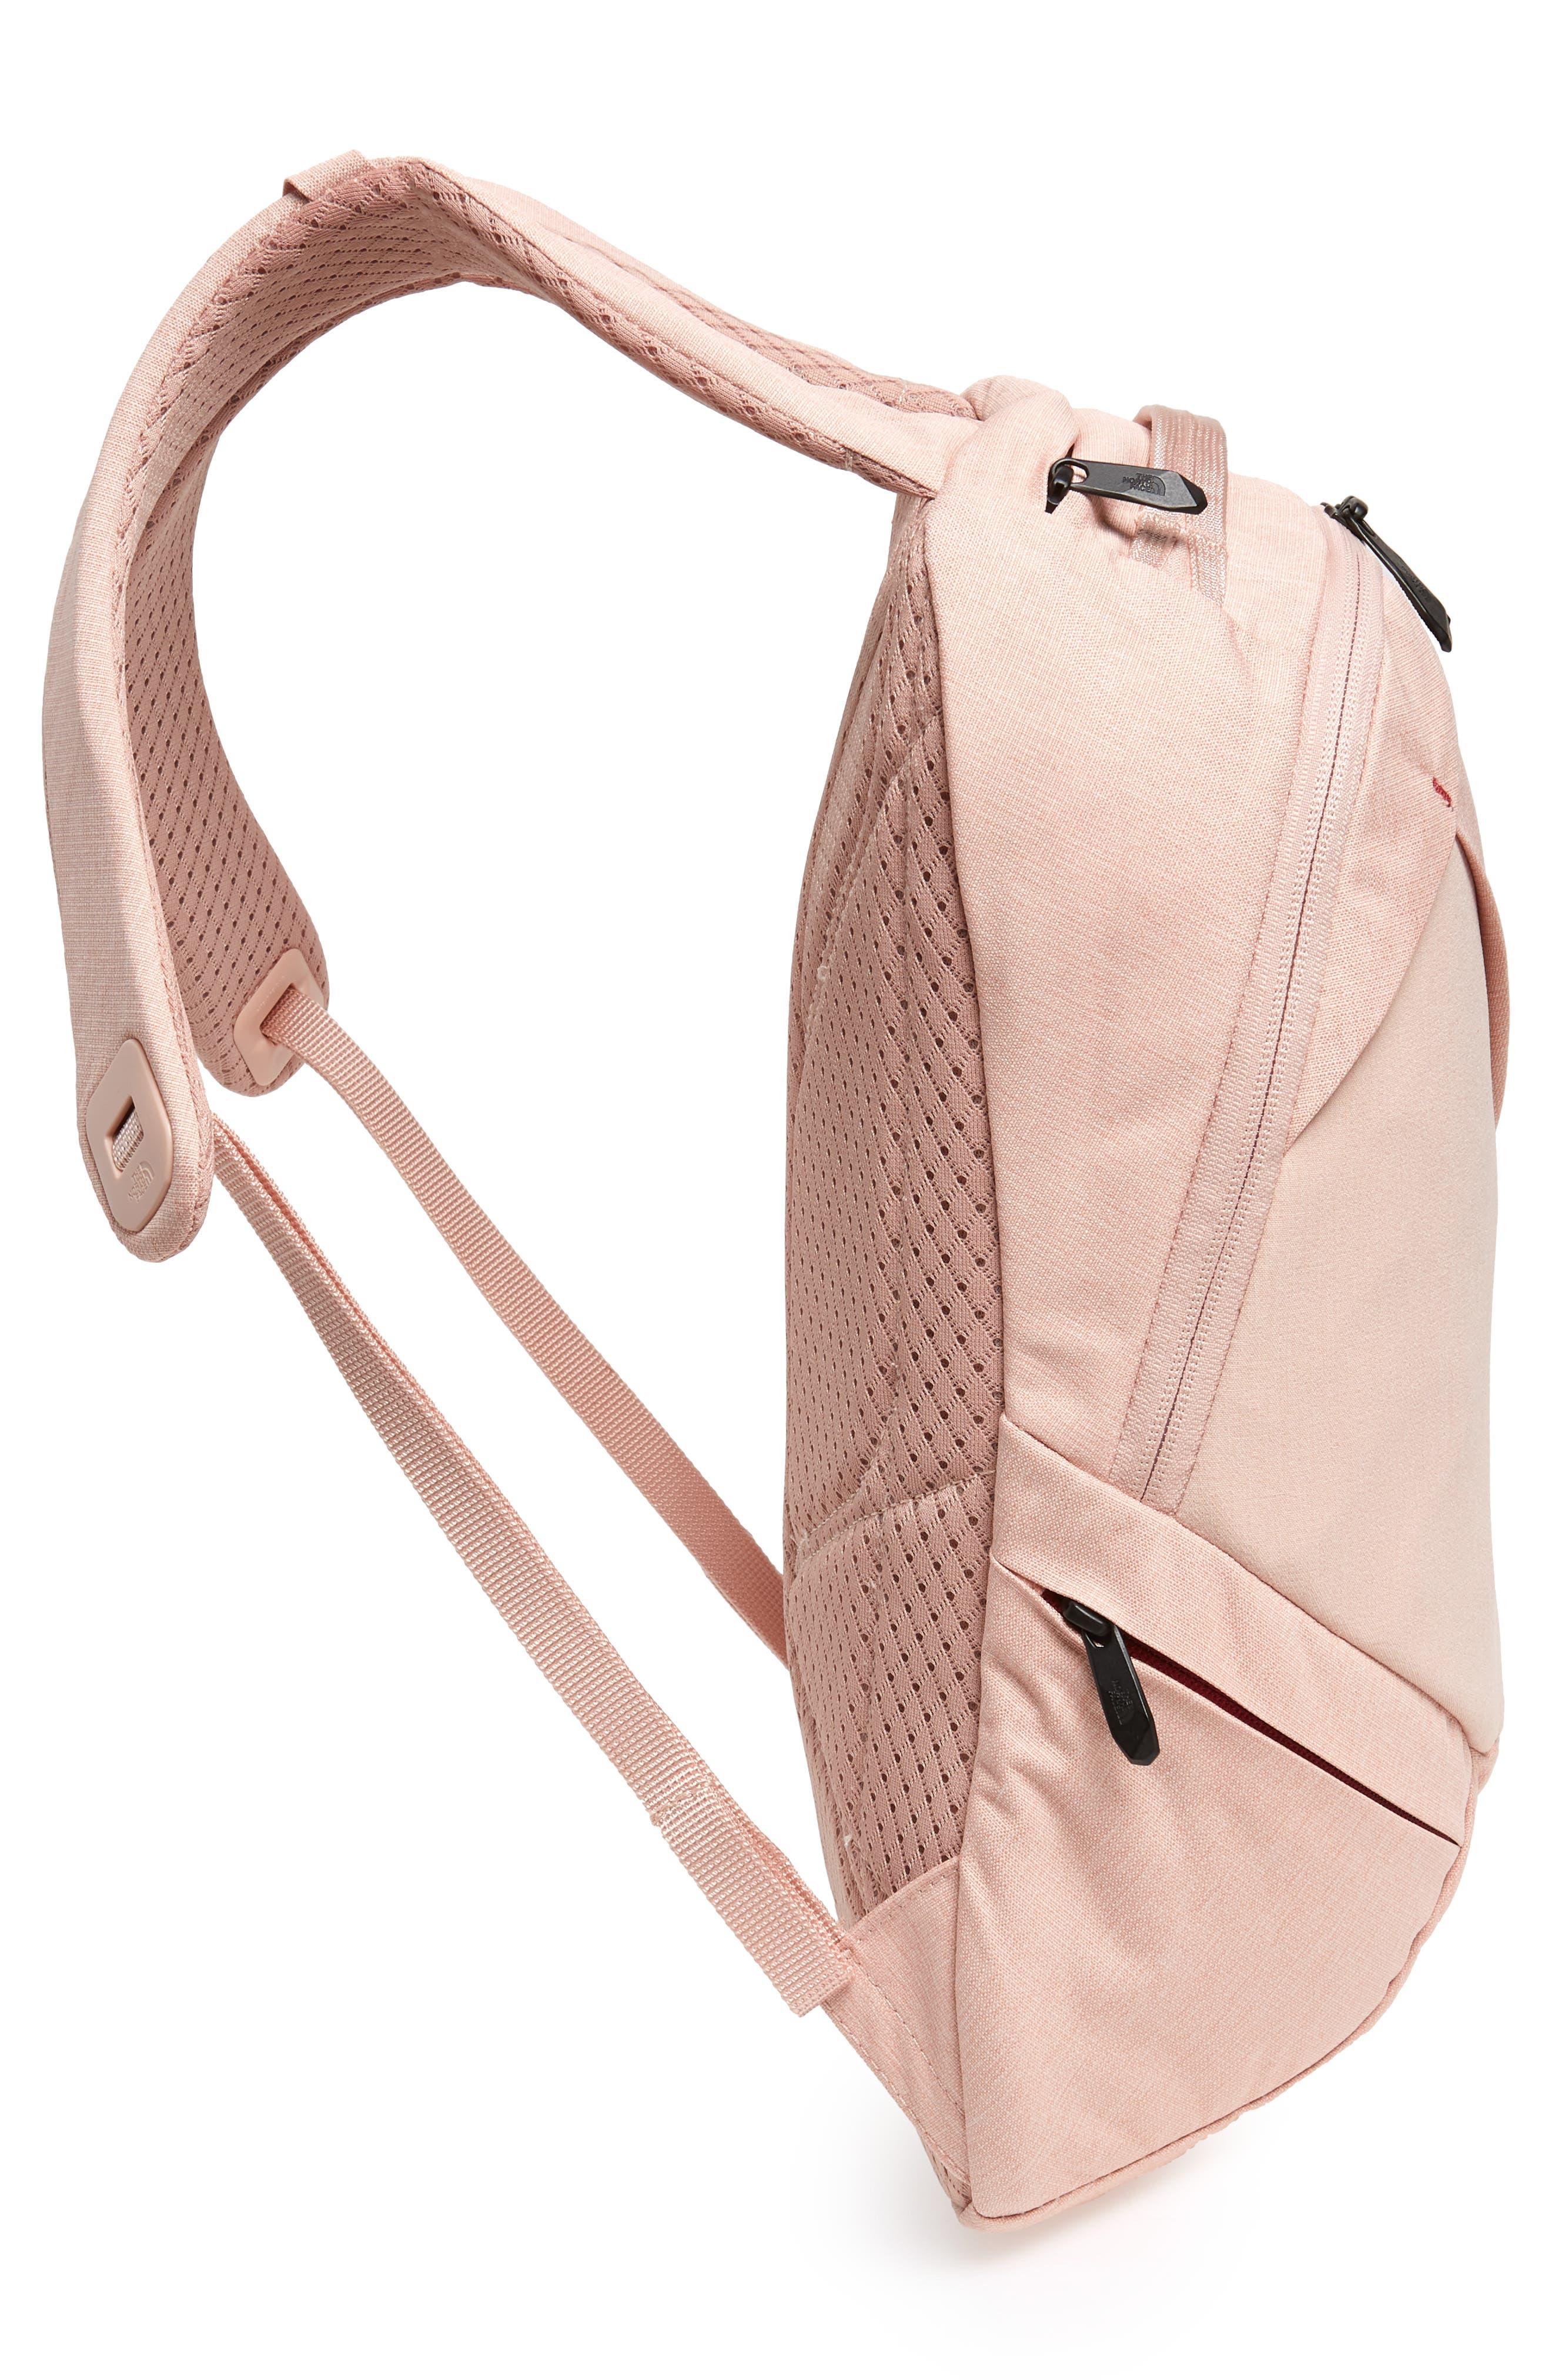 Electra Backpack,                             Alternate thumbnail 3, color,                             Misty Rose Heather